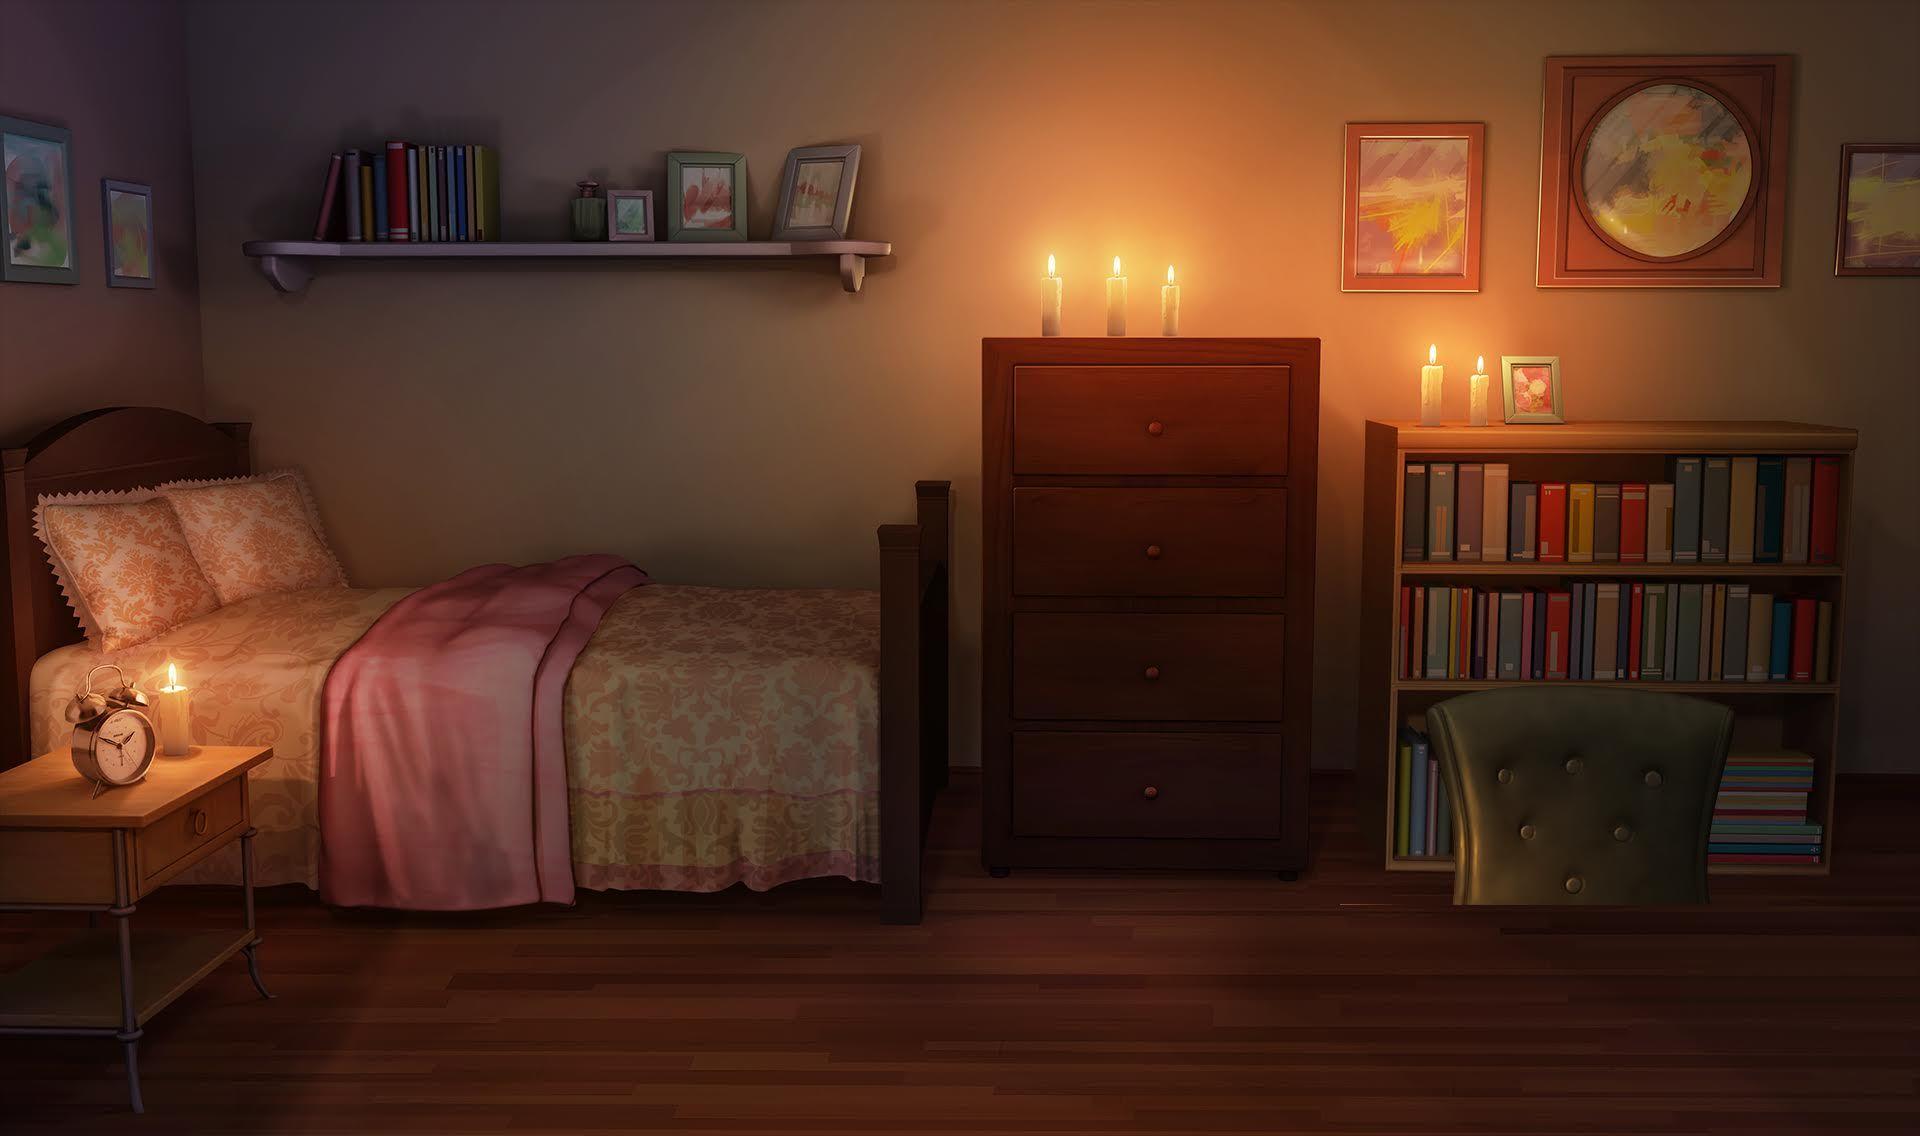 Romantic Anime Bedroom Anime Living Room Background Night